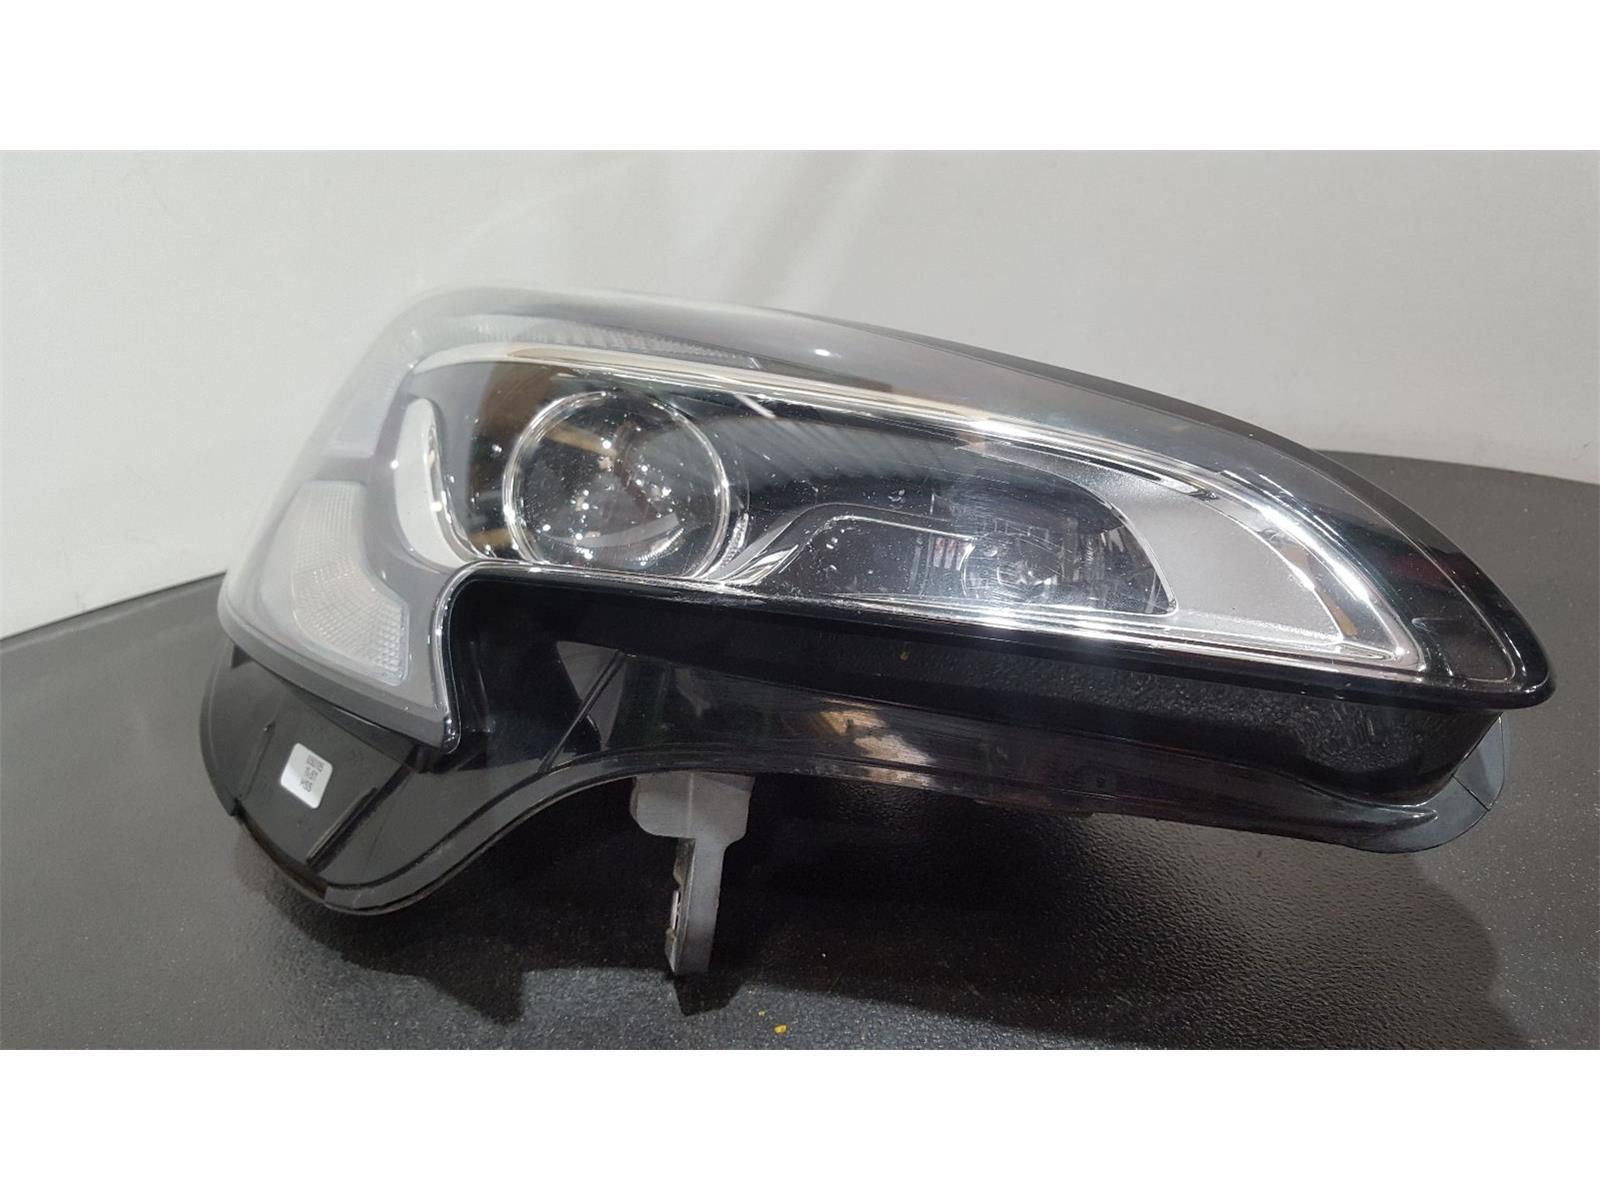 Vauxhall Corsa 2014 On O/S Right Drivers Side Headlamp Headlight 1LF011830-12